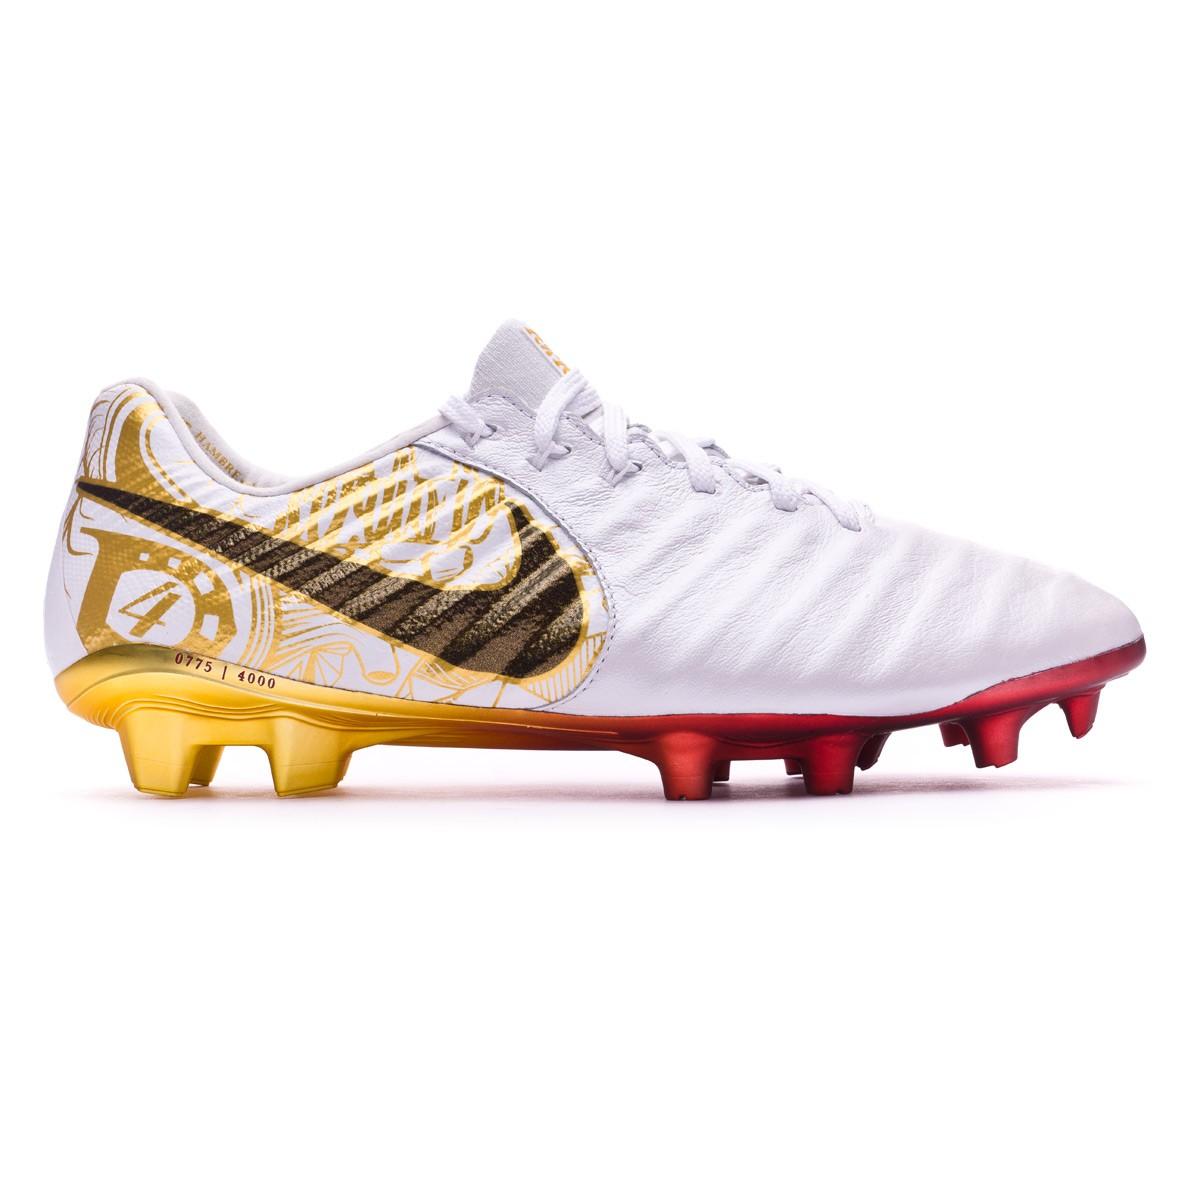 Chaussure de foot Nike Tiempo Legend VII SR4 FG